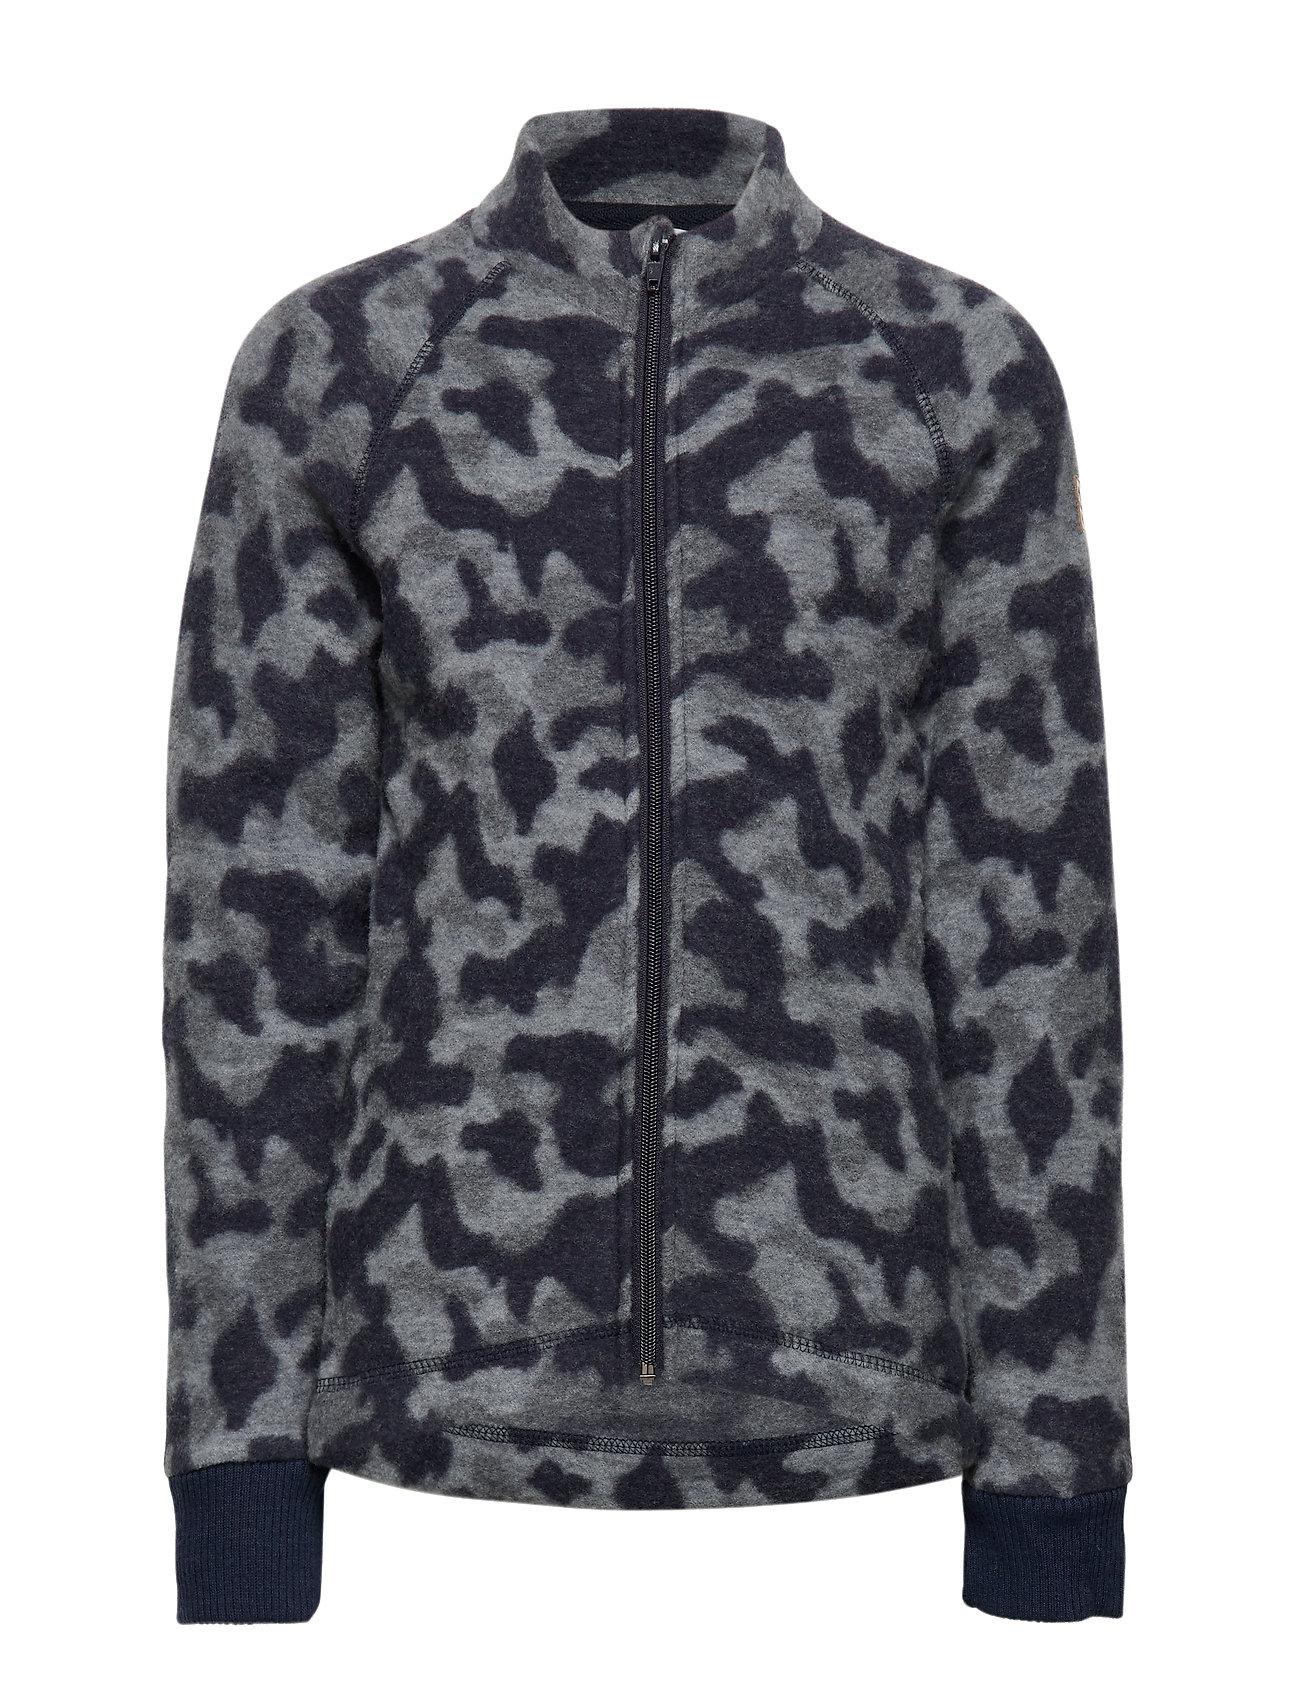 Mikk-Line WOOL Jacquard Jacket - BLUE NIGHTS